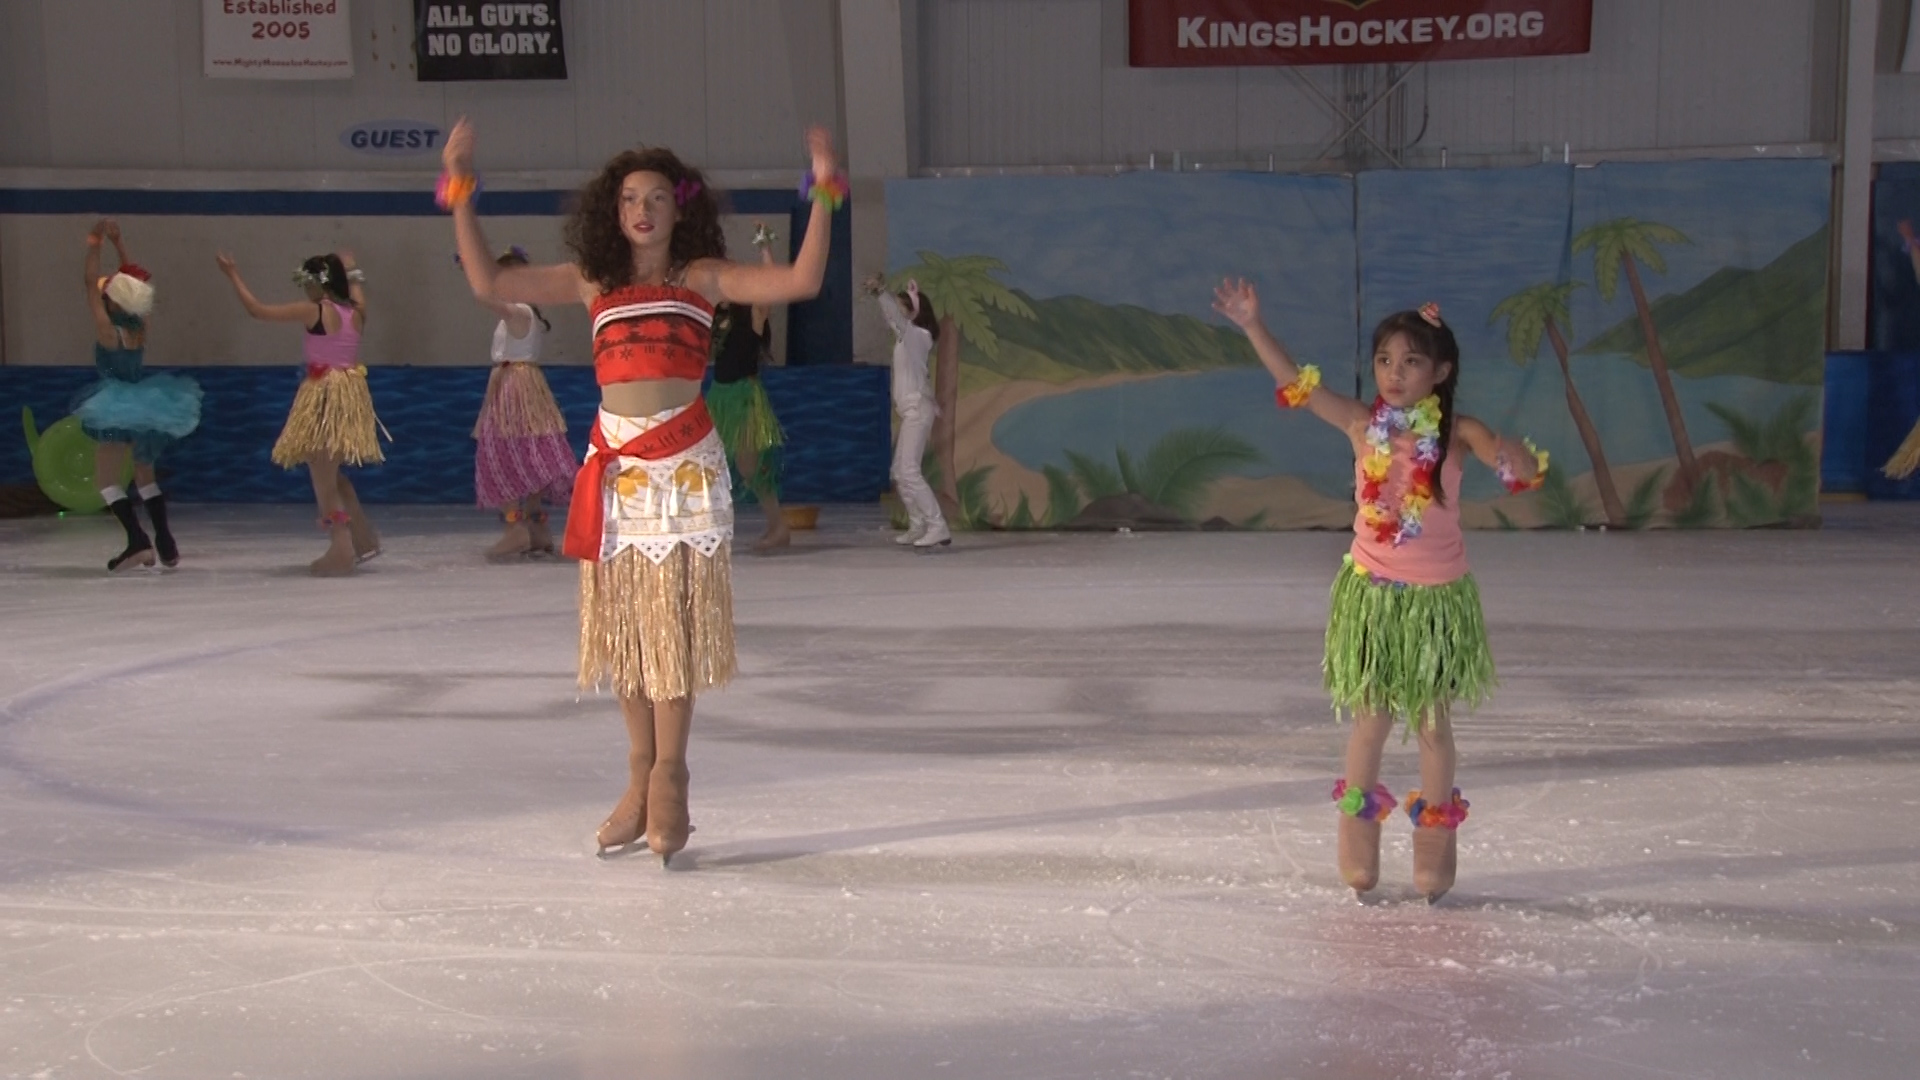 Power Play Maui Skate on Ice 071417.00_14_30_21.Still025.jpg